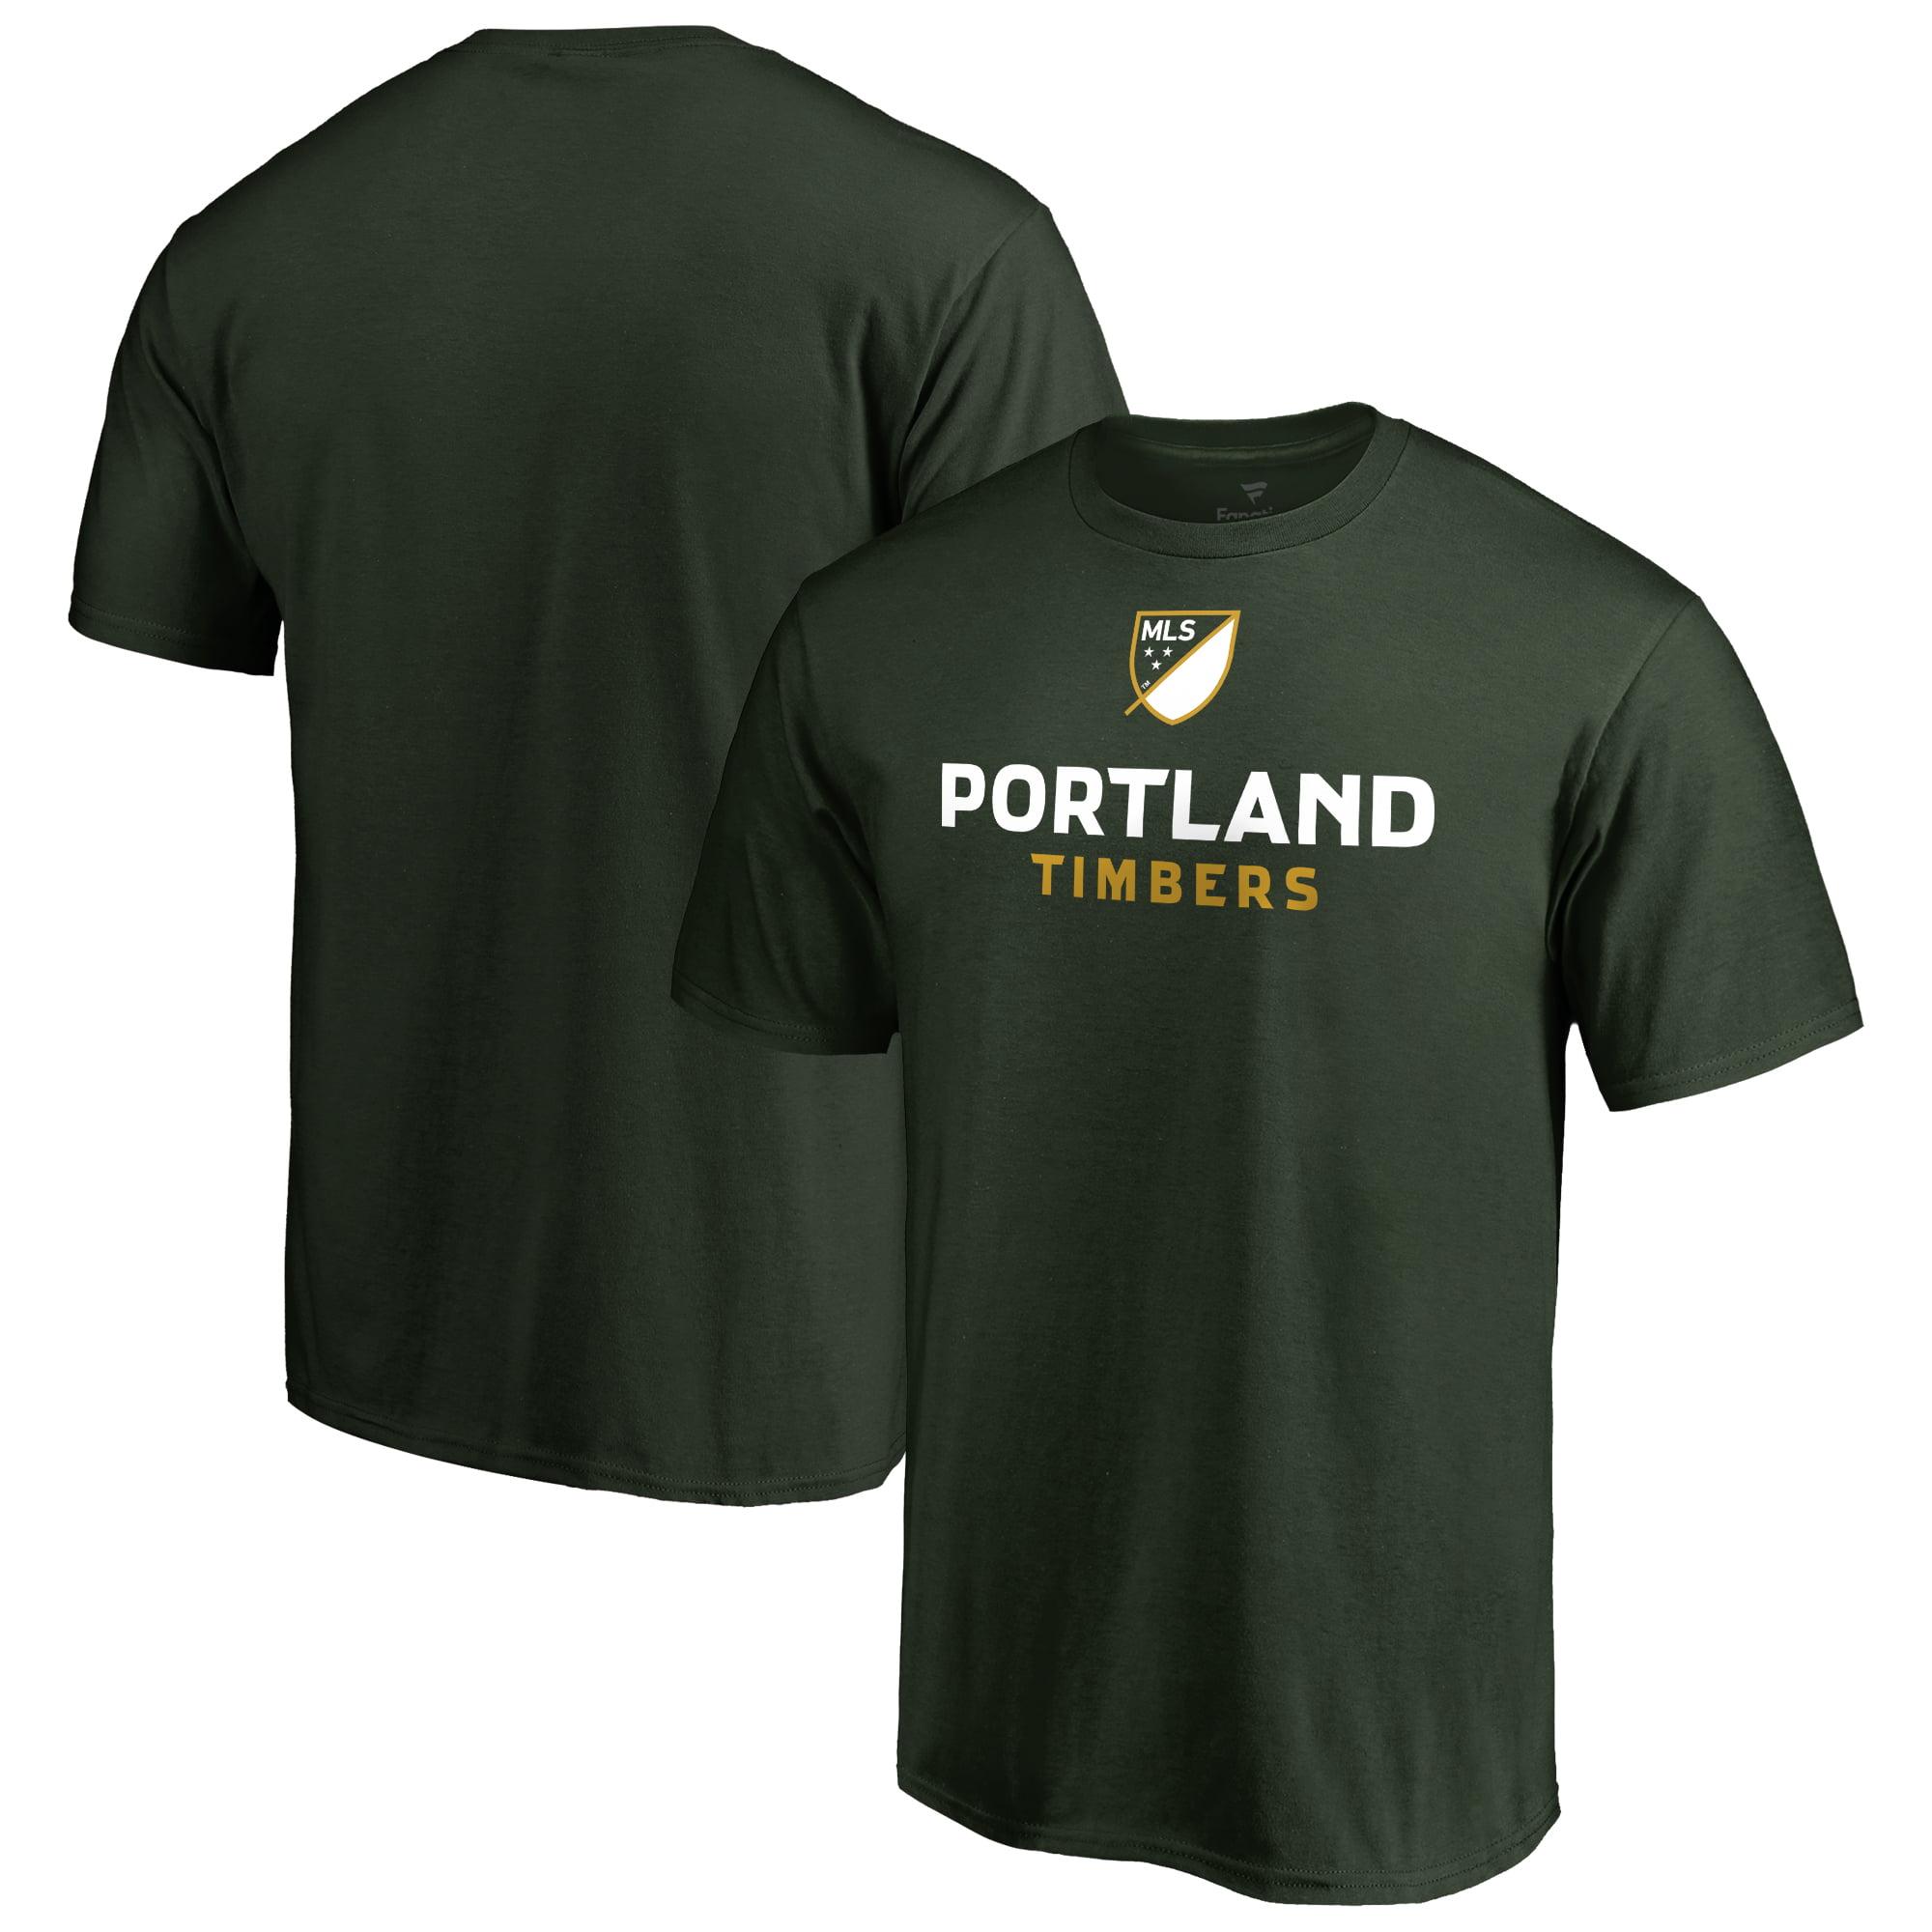 Portland Timbers Fanatics Branded Shielded T-Shirt - Green